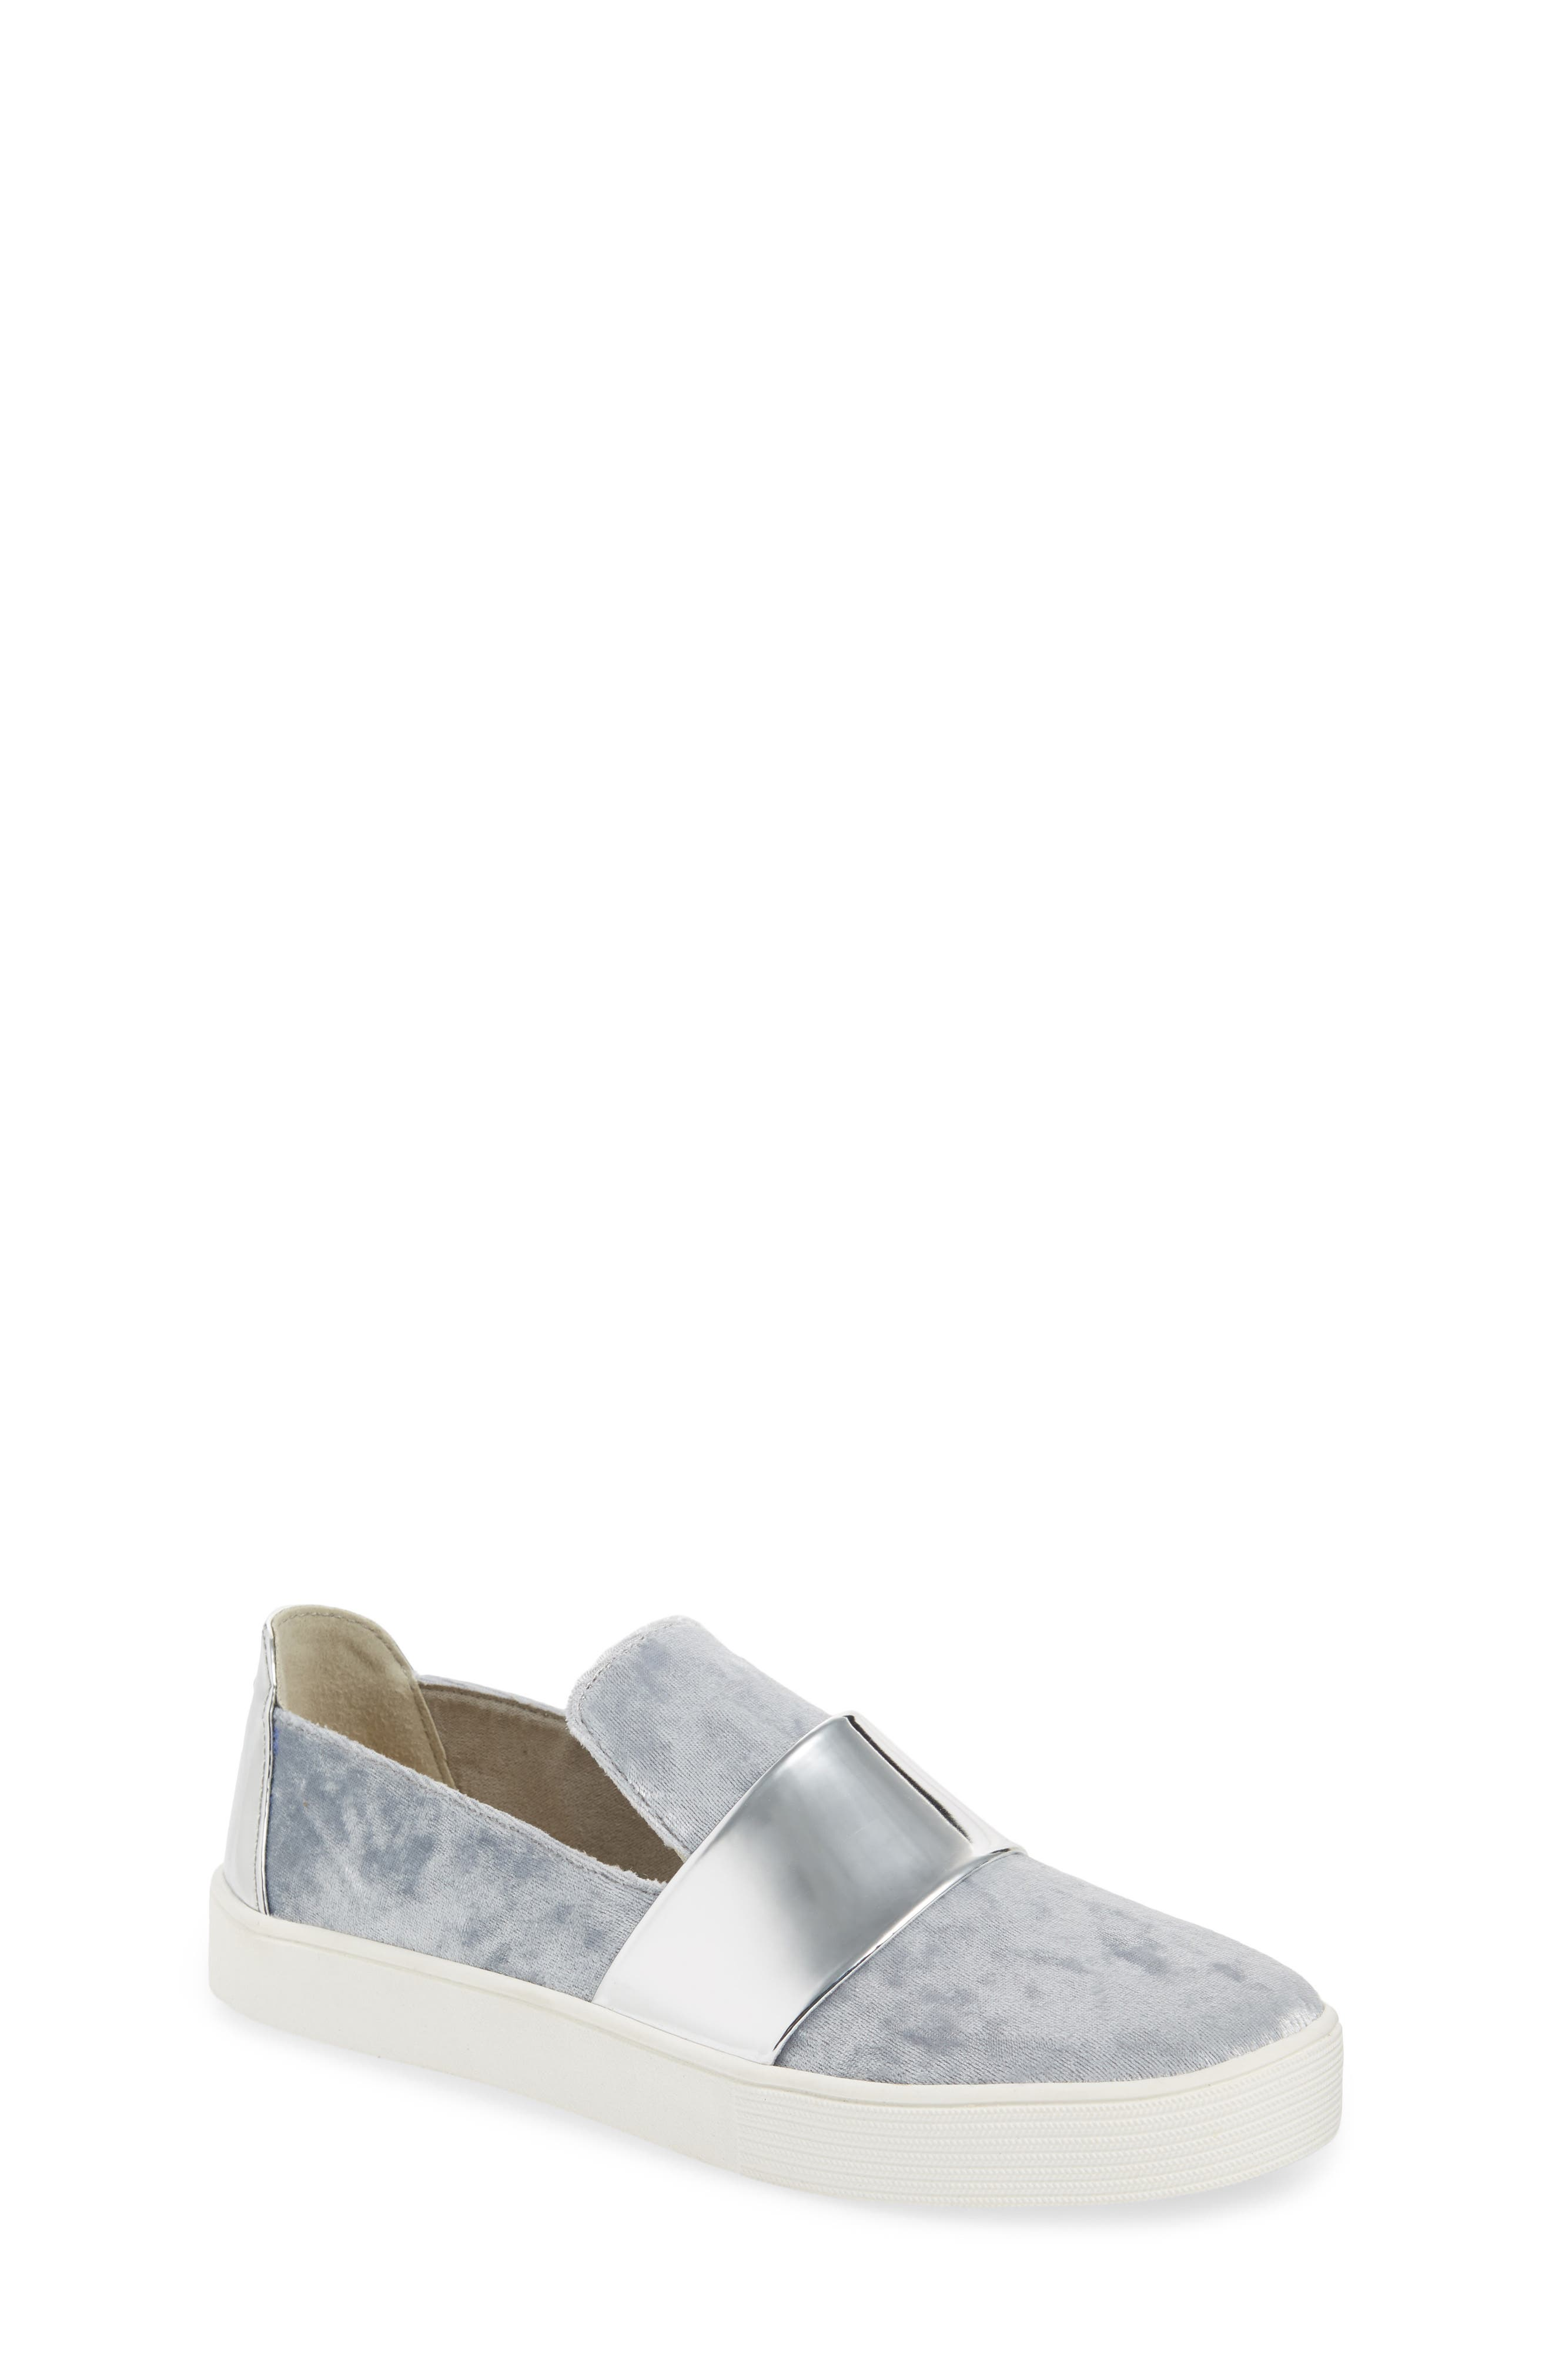 Vance Slip-On Sneaker,                             Main thumbnail 1, color,                             Silver